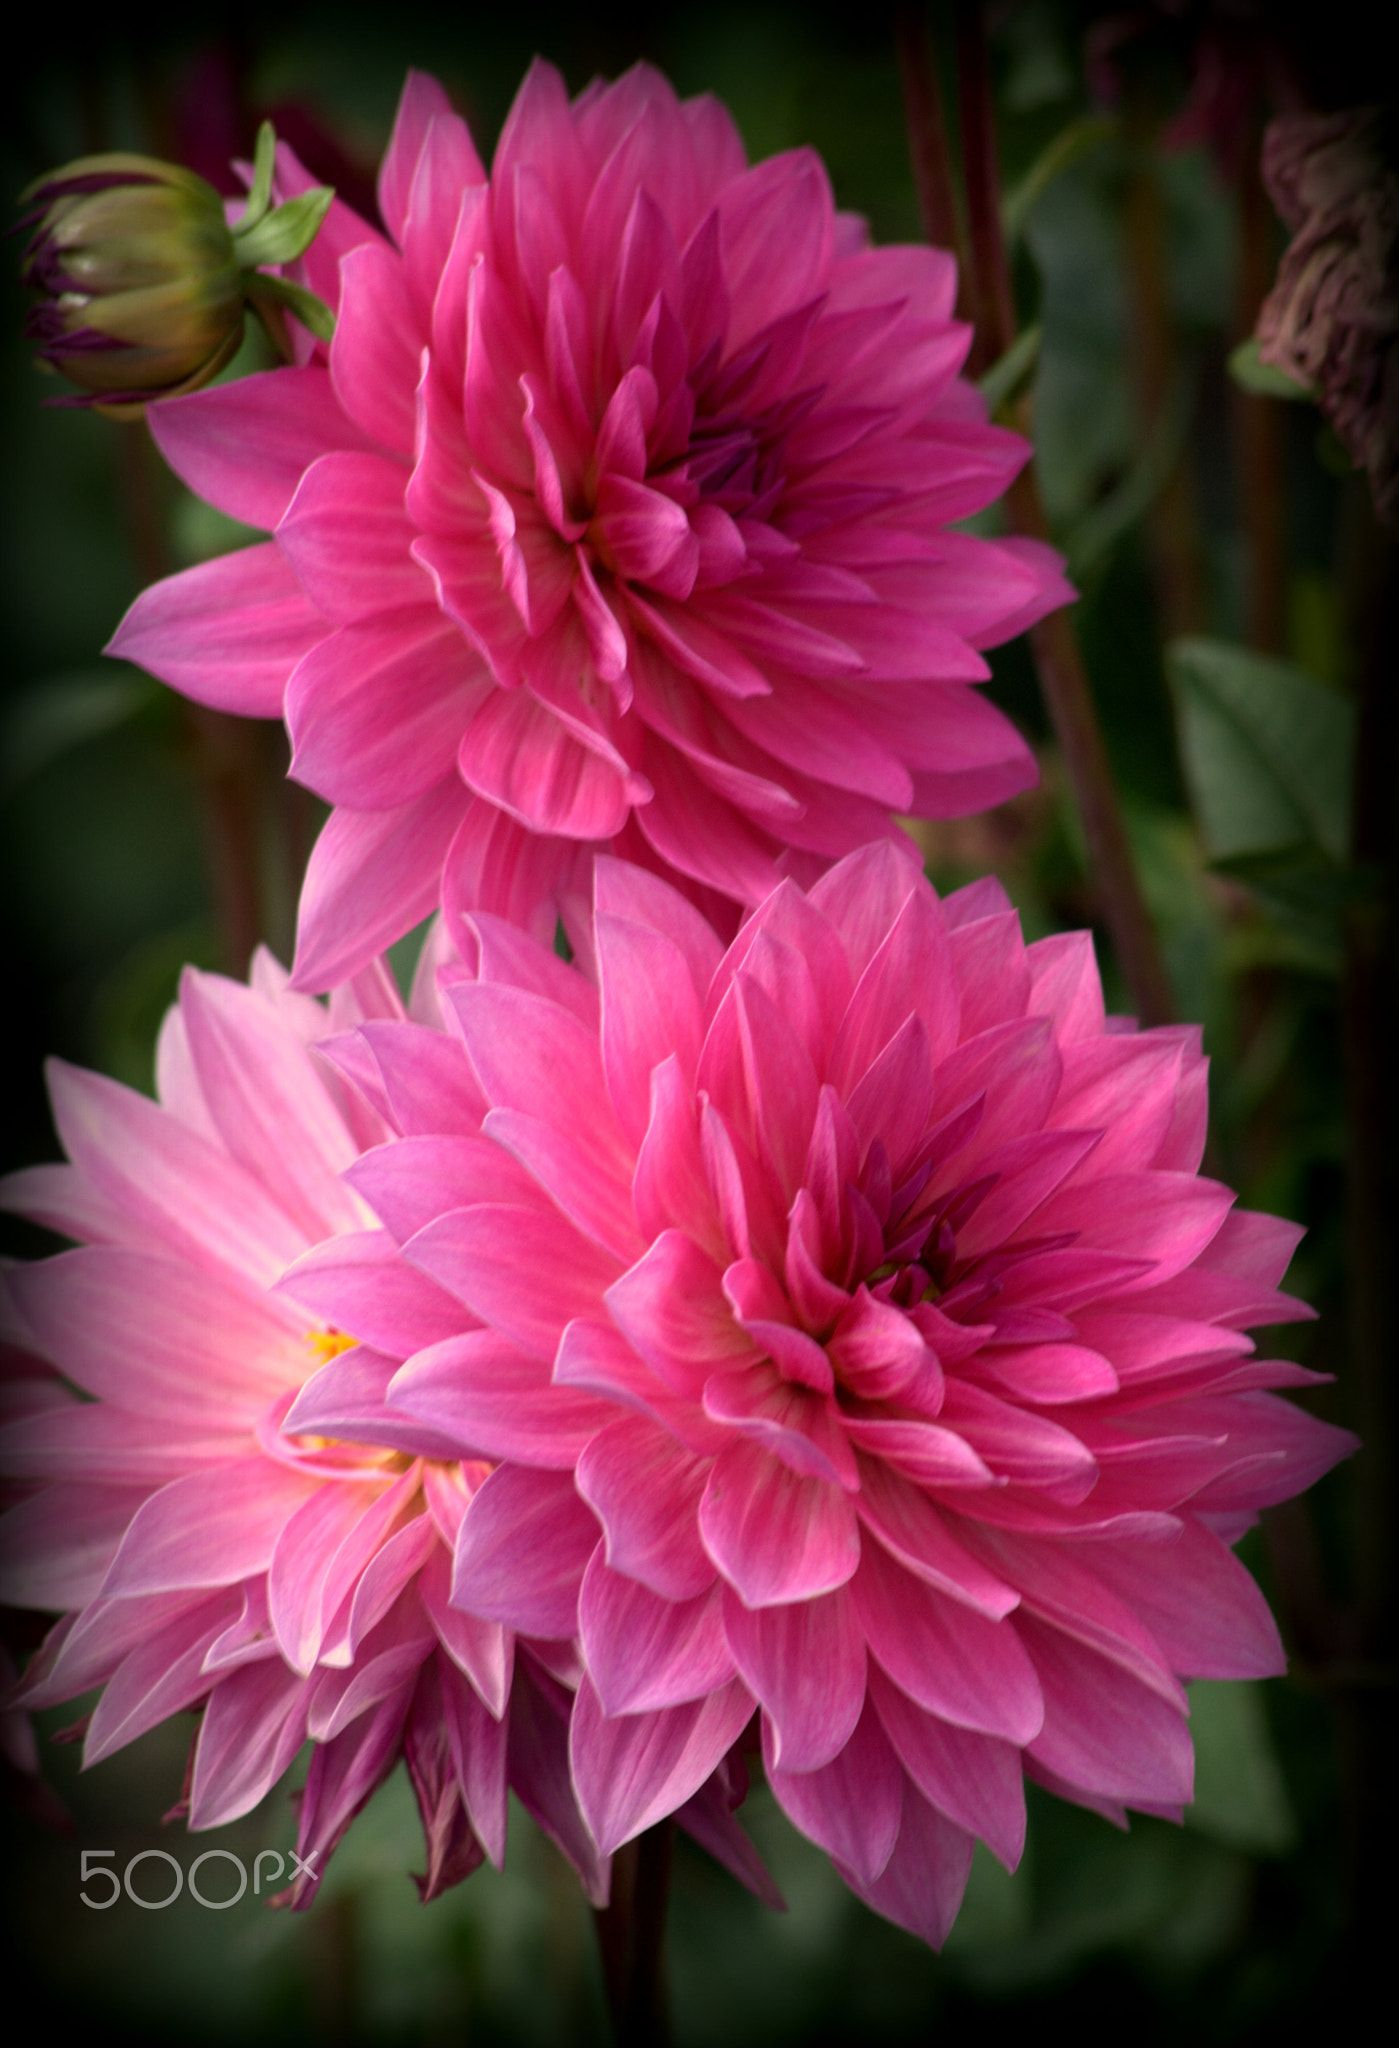 Pink dahlia flowers radiant pinterest dahlia flowers pink dahlia flowers izmirmasajfo